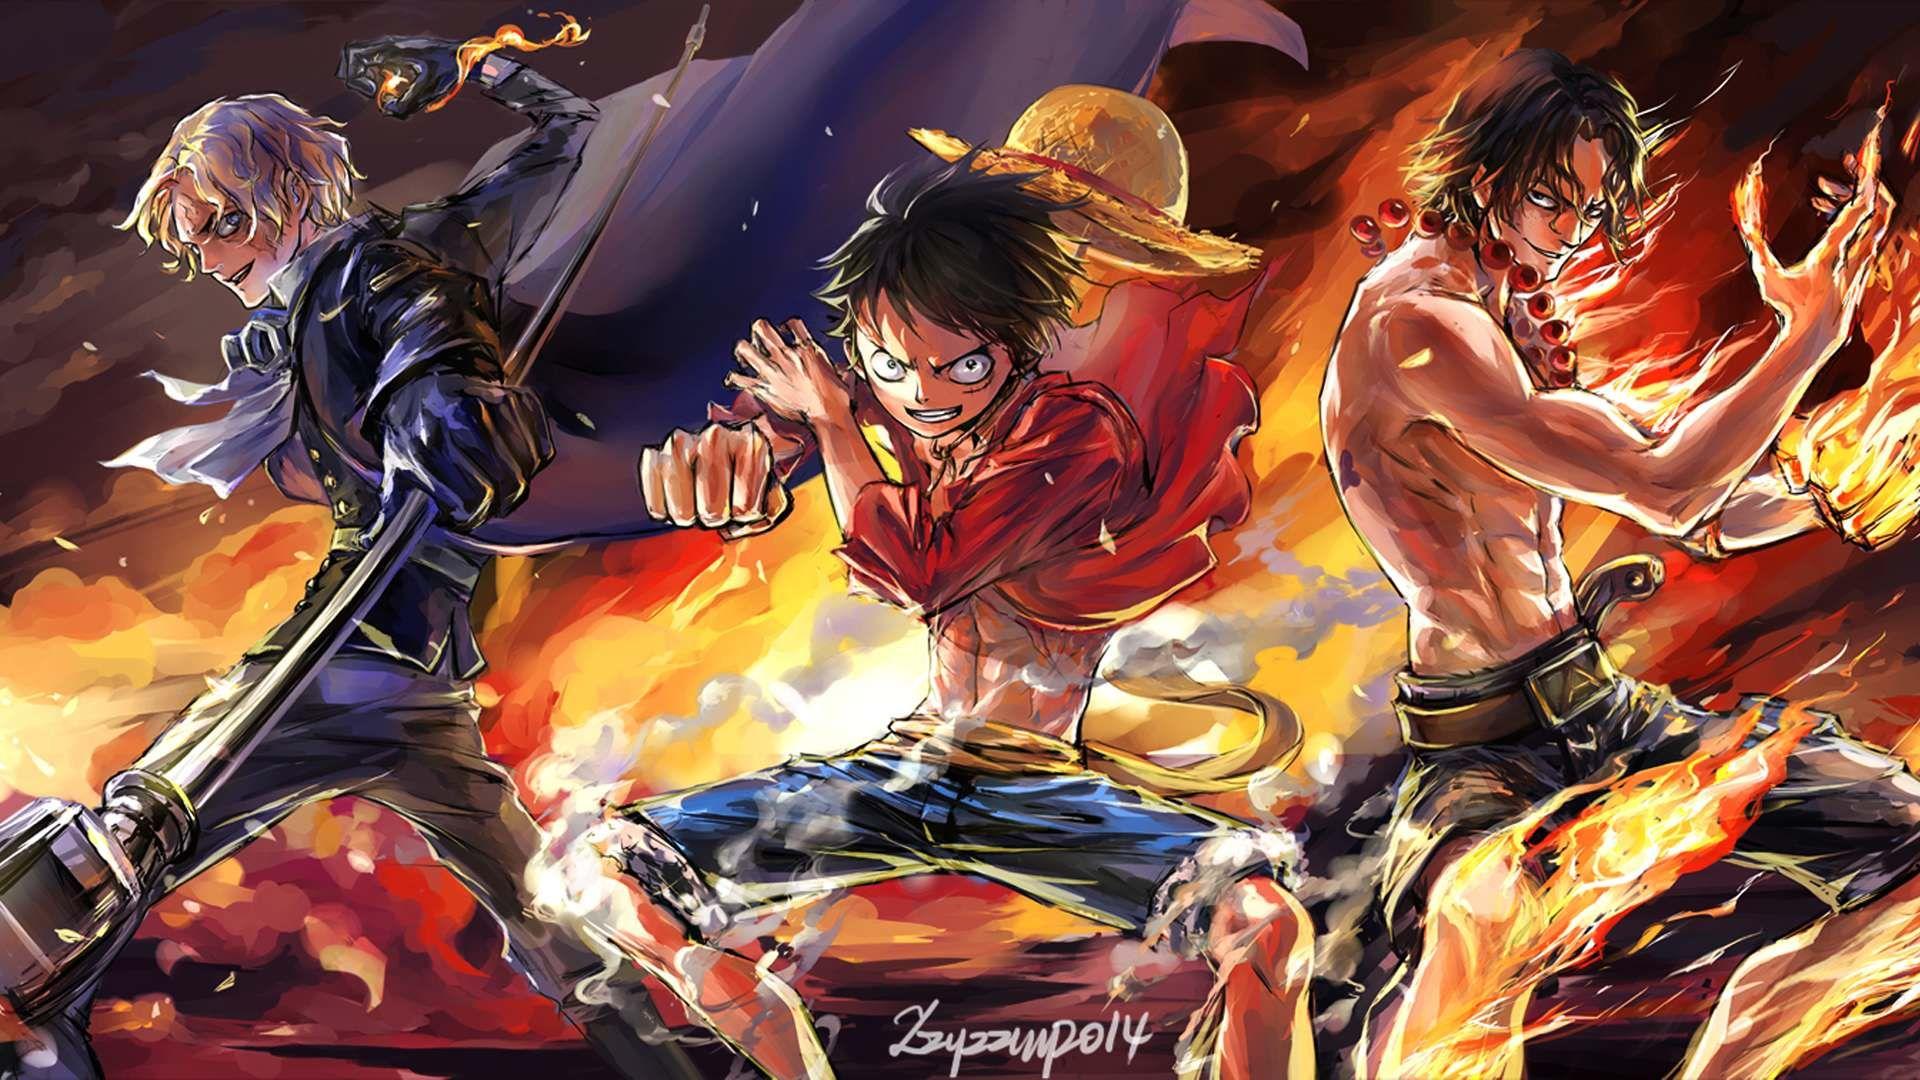 Ace Sabo Luffy Hd: Sabo Monkey D Luffy Portgas D Ace Battle Anime One Piece